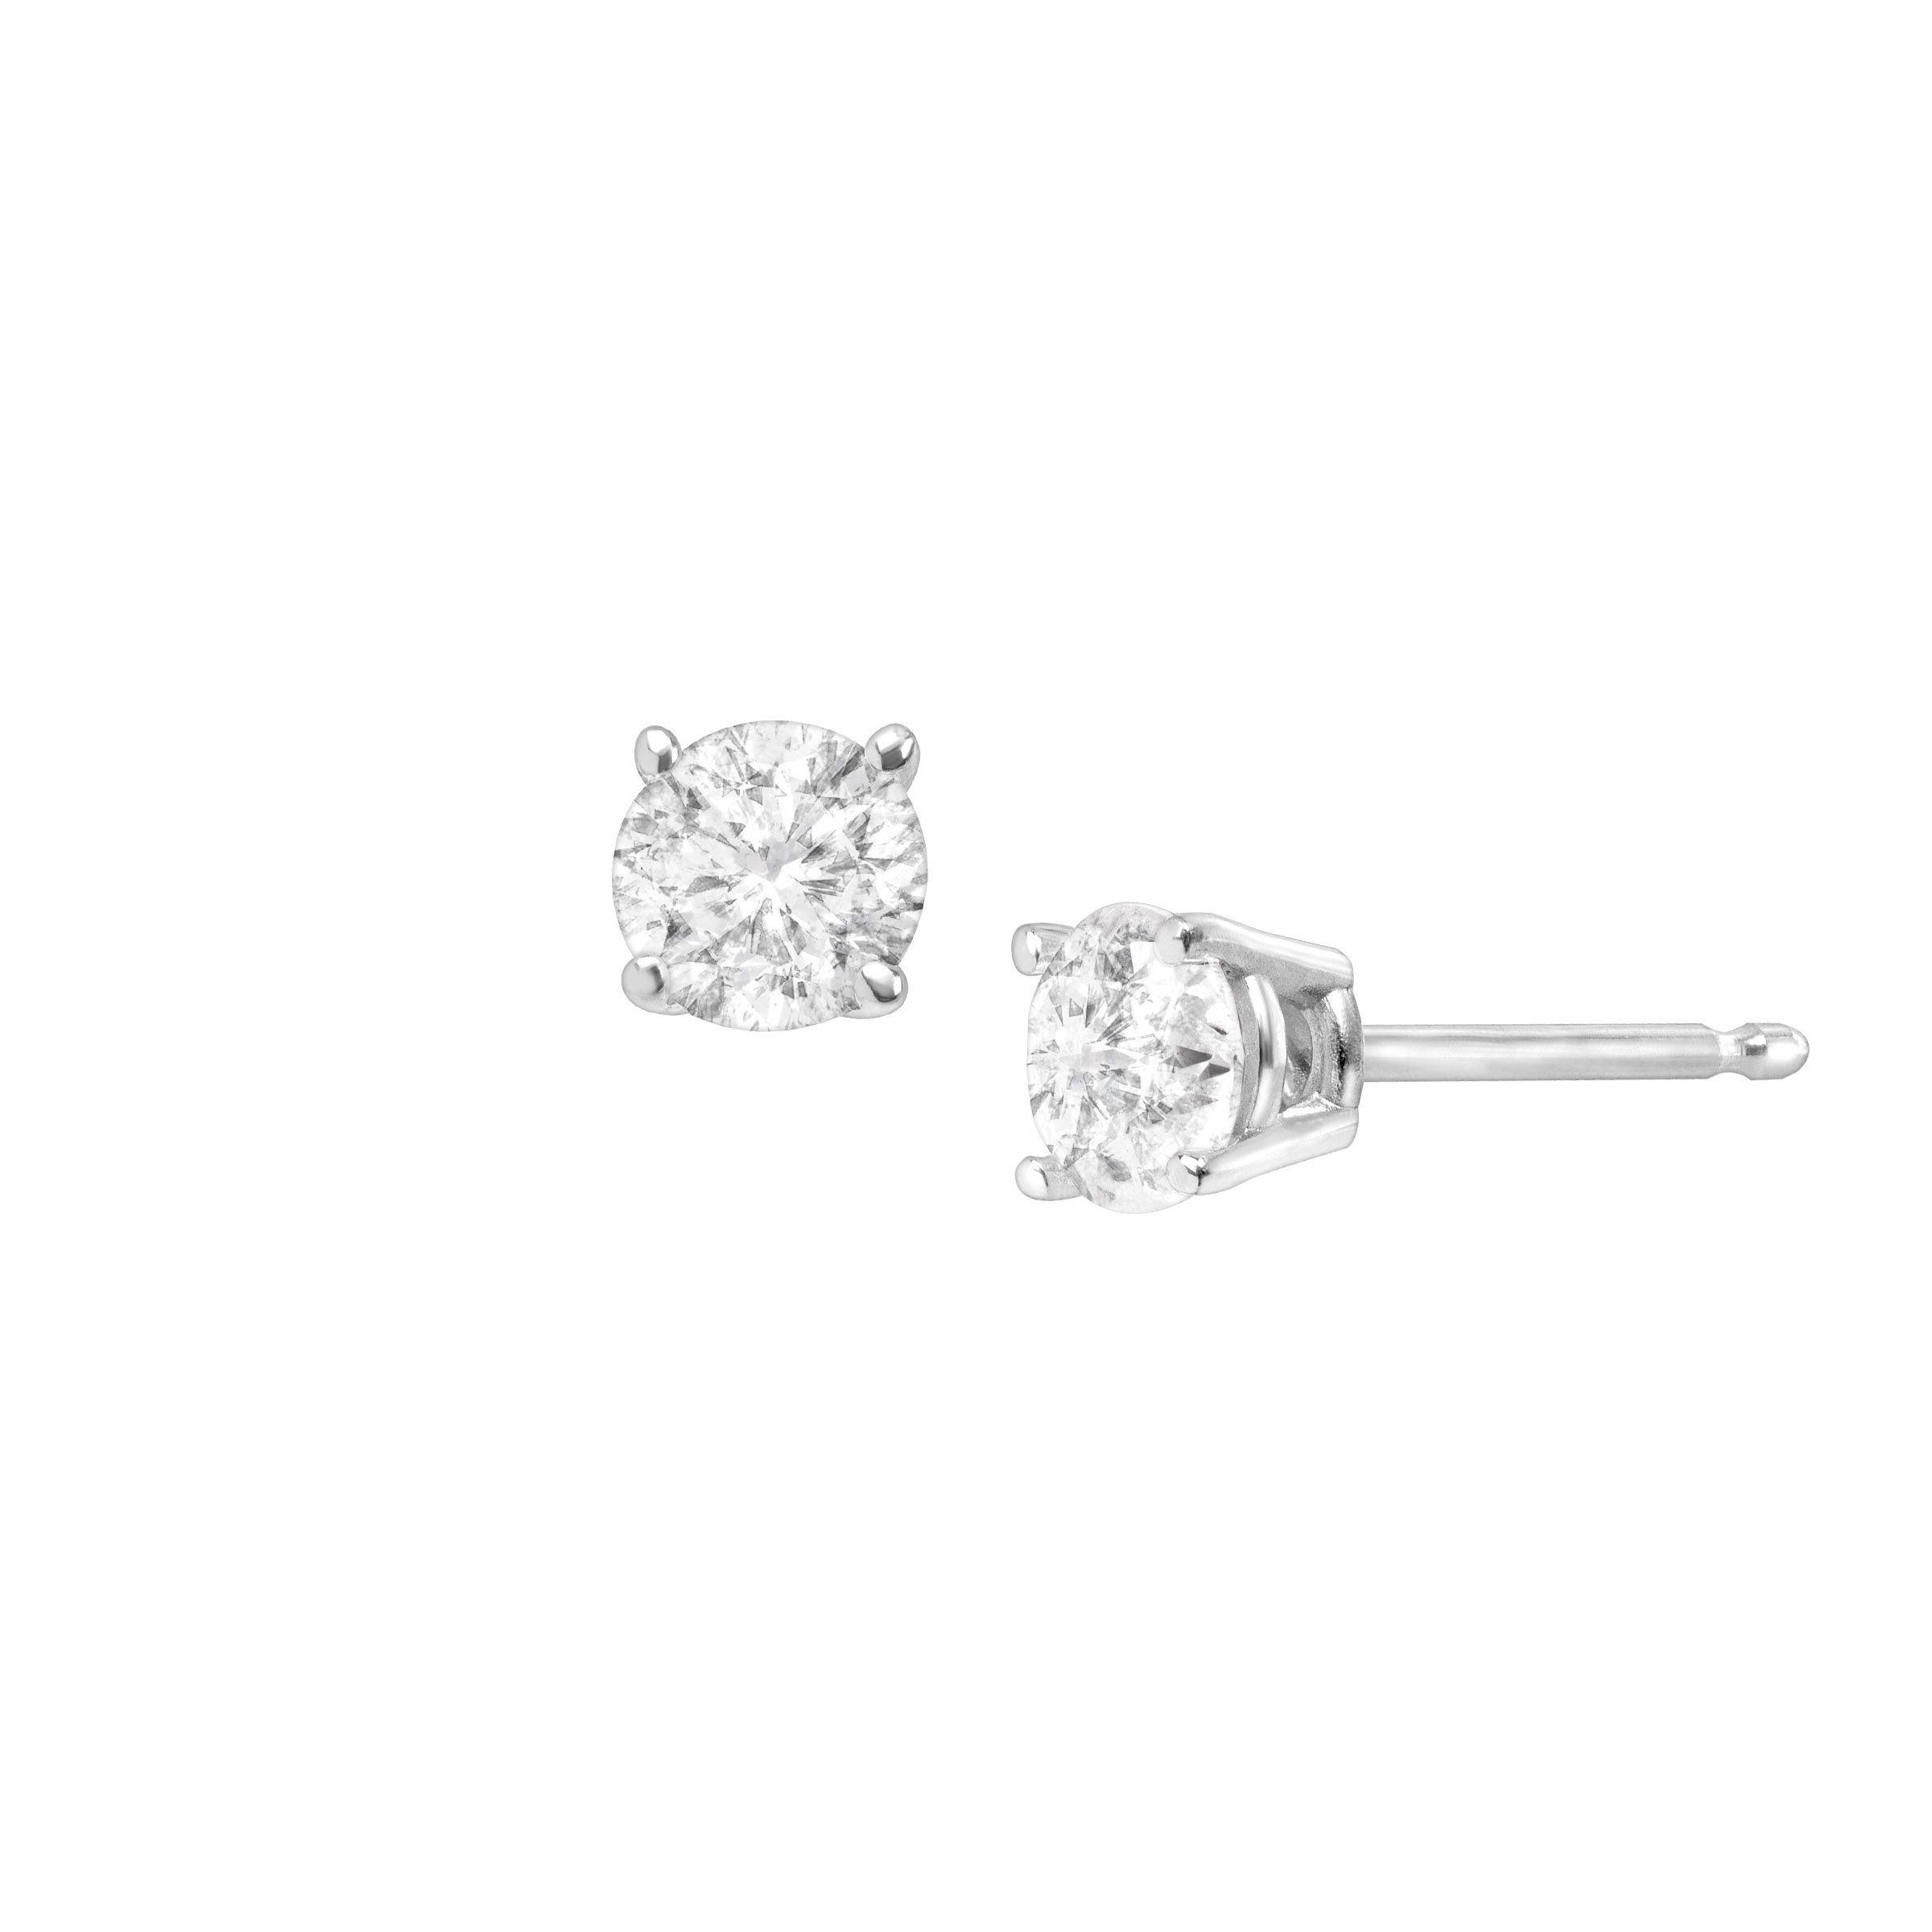 1 2 Ct Round Cut Diamond Stud Earrings In 14k White Gold